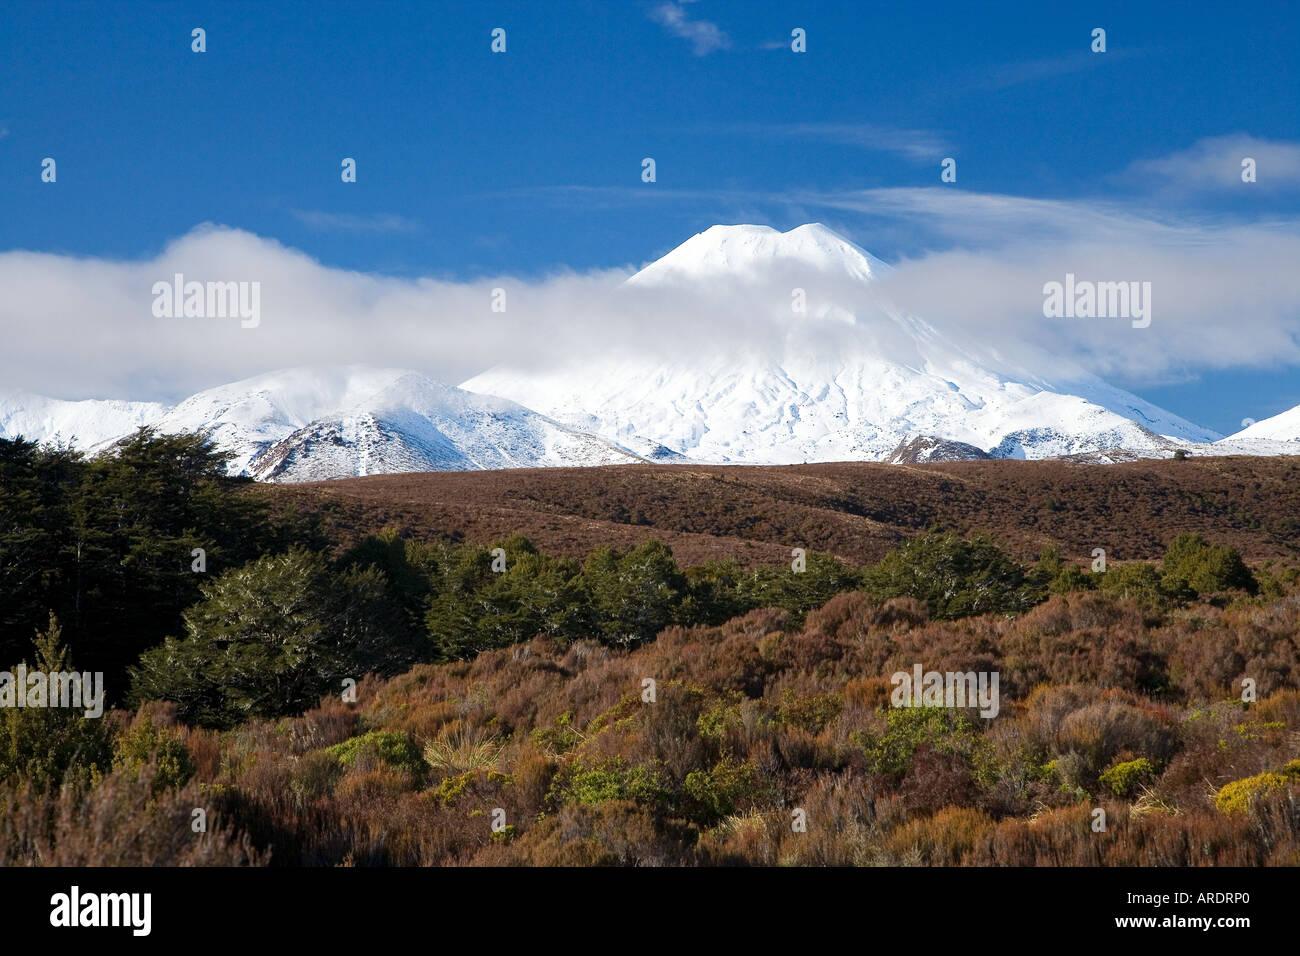 Mt Ngauruhoe Tongariro National Park Central Plateau North Island New Zealand - Stock Image